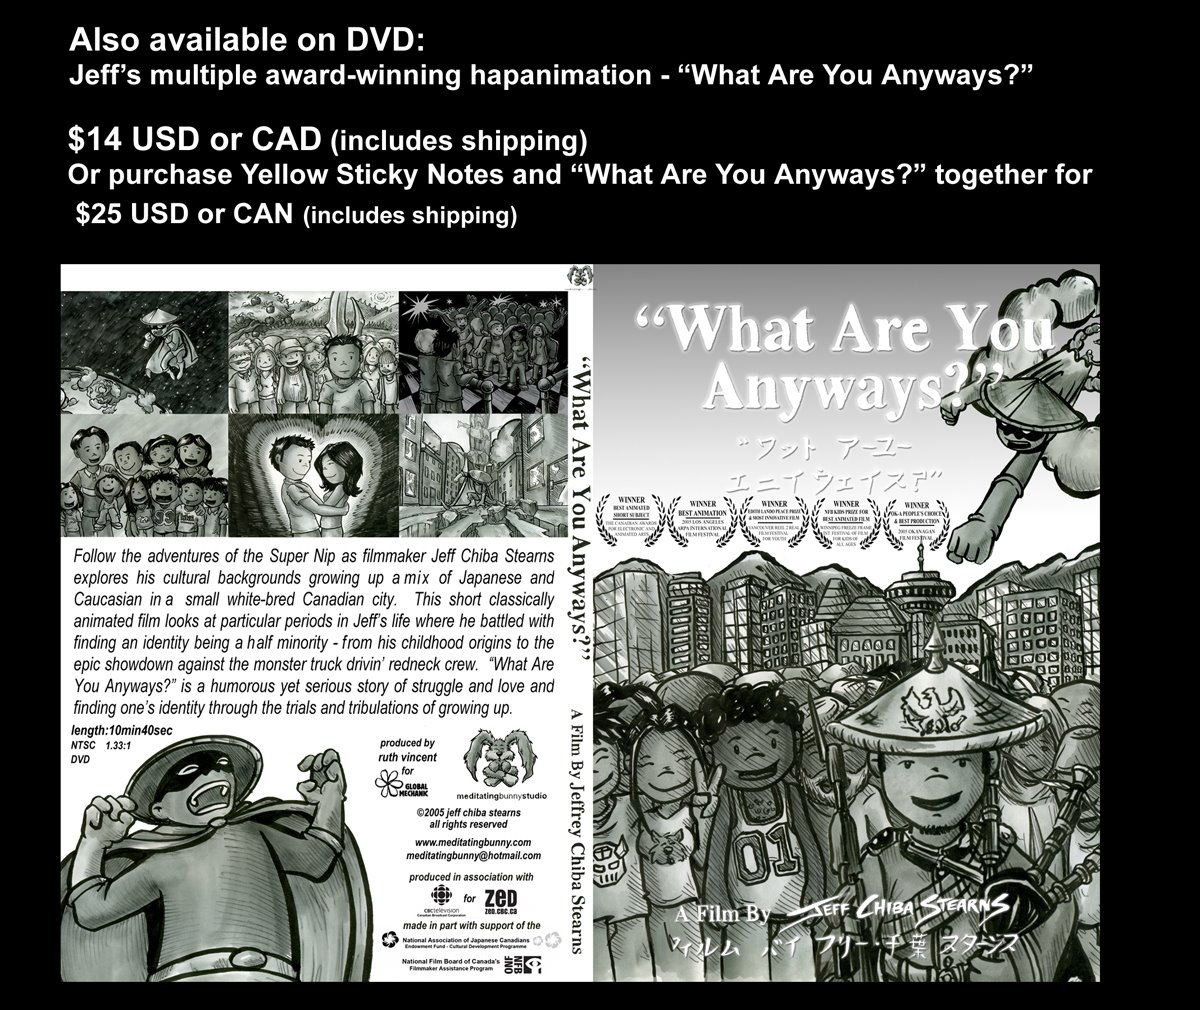 [WAYA_DVD_Sales.jpg]